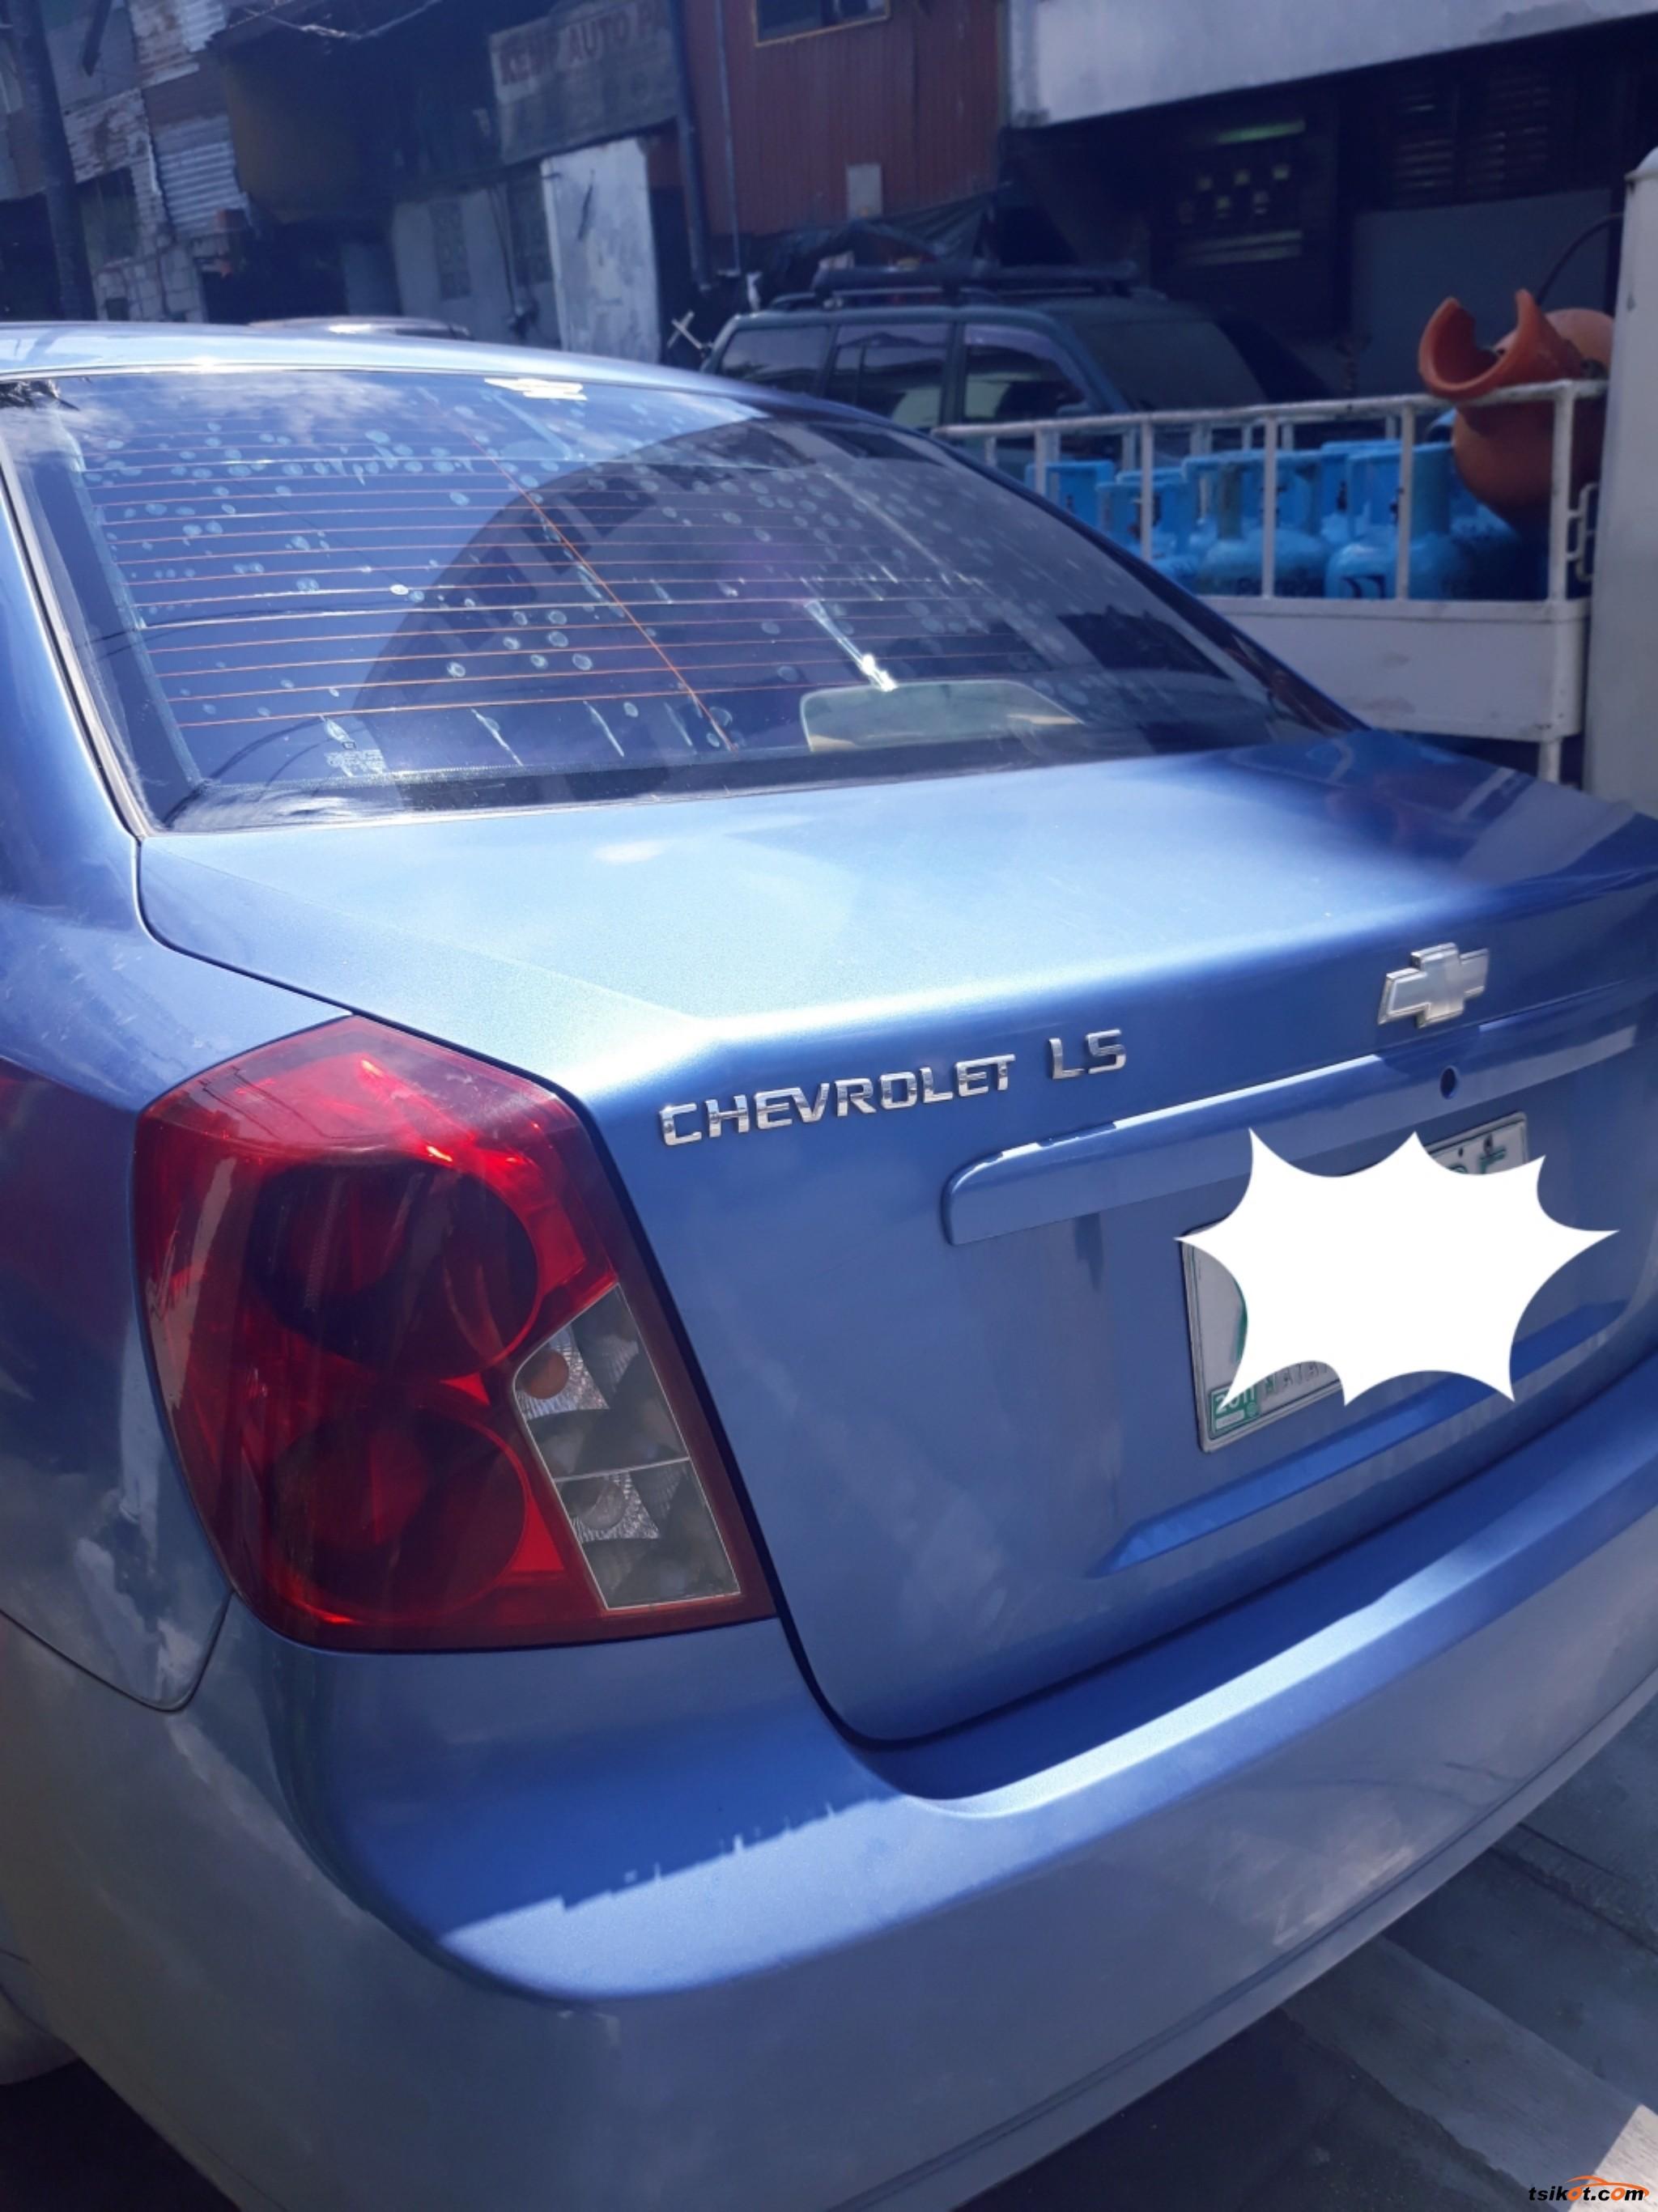 Chevrolet Optra 2004 - 2